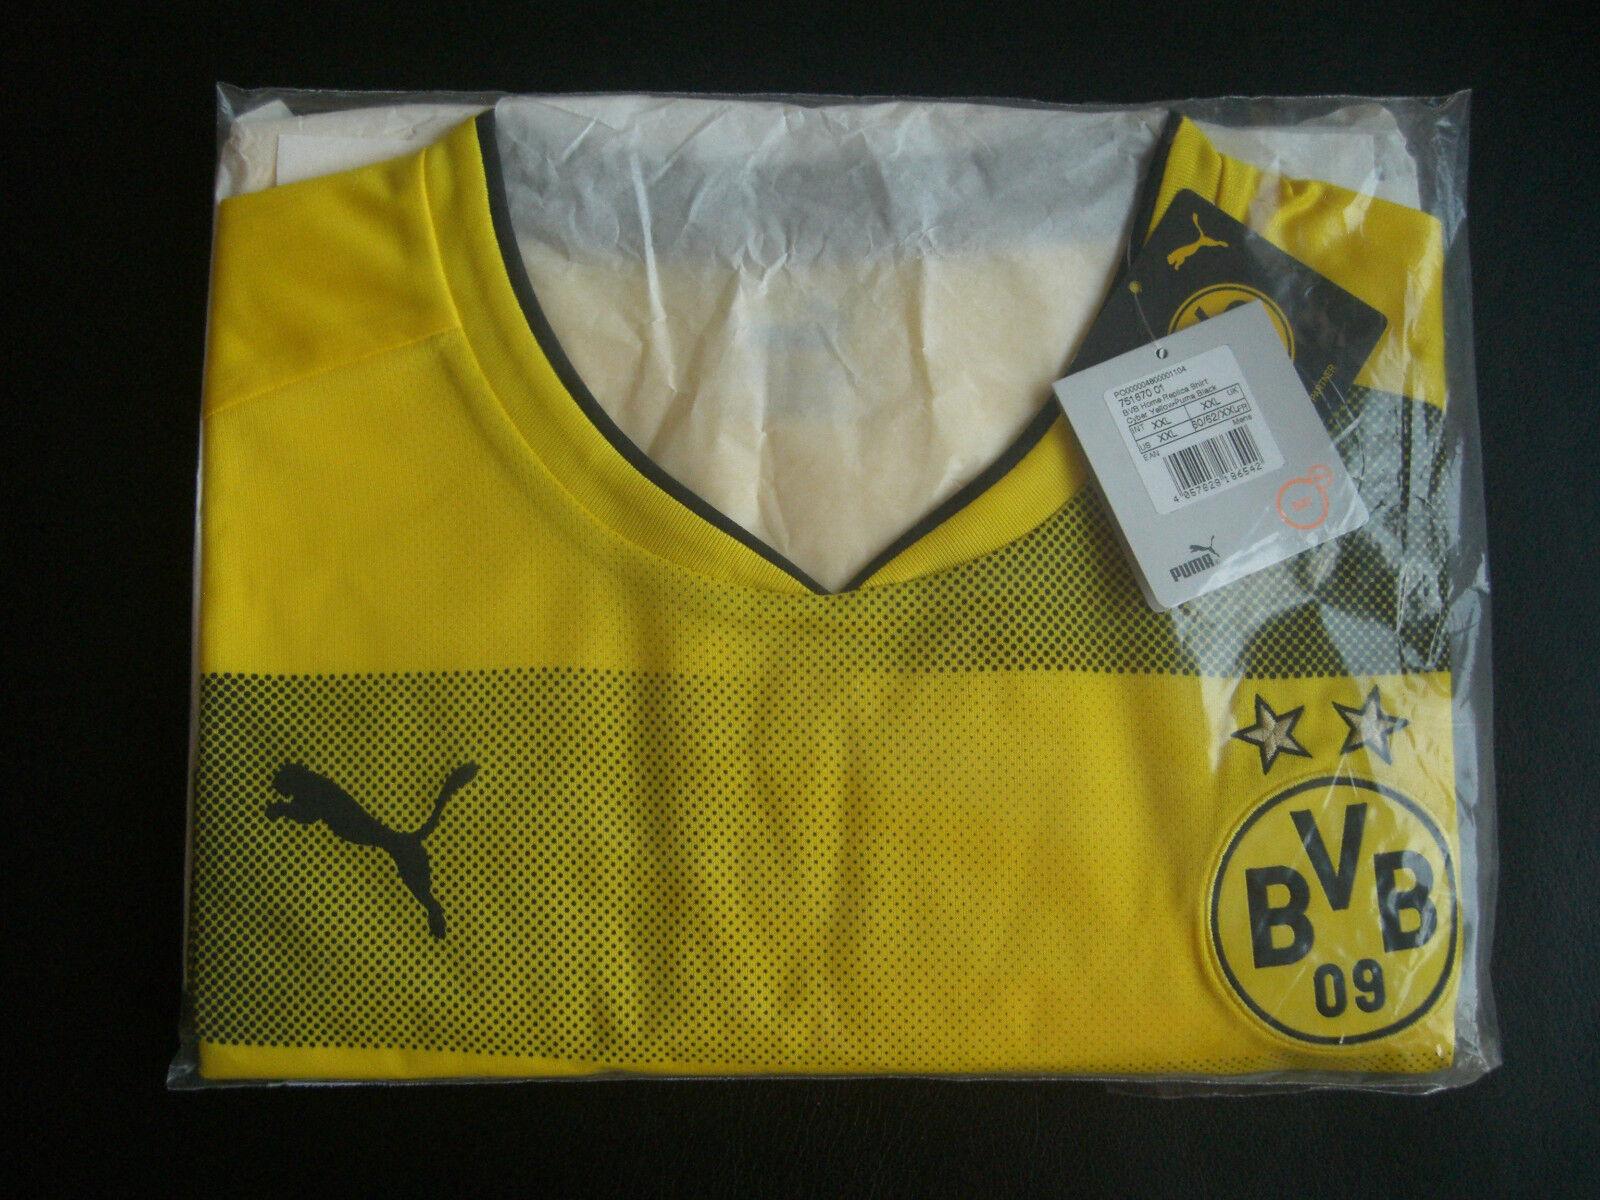 BVB 09 Borussia Dortmund Puma Evonik Trikot NEU Home OVP 2017 / 2018 NEU OVP Home TOP 1a 727d5d